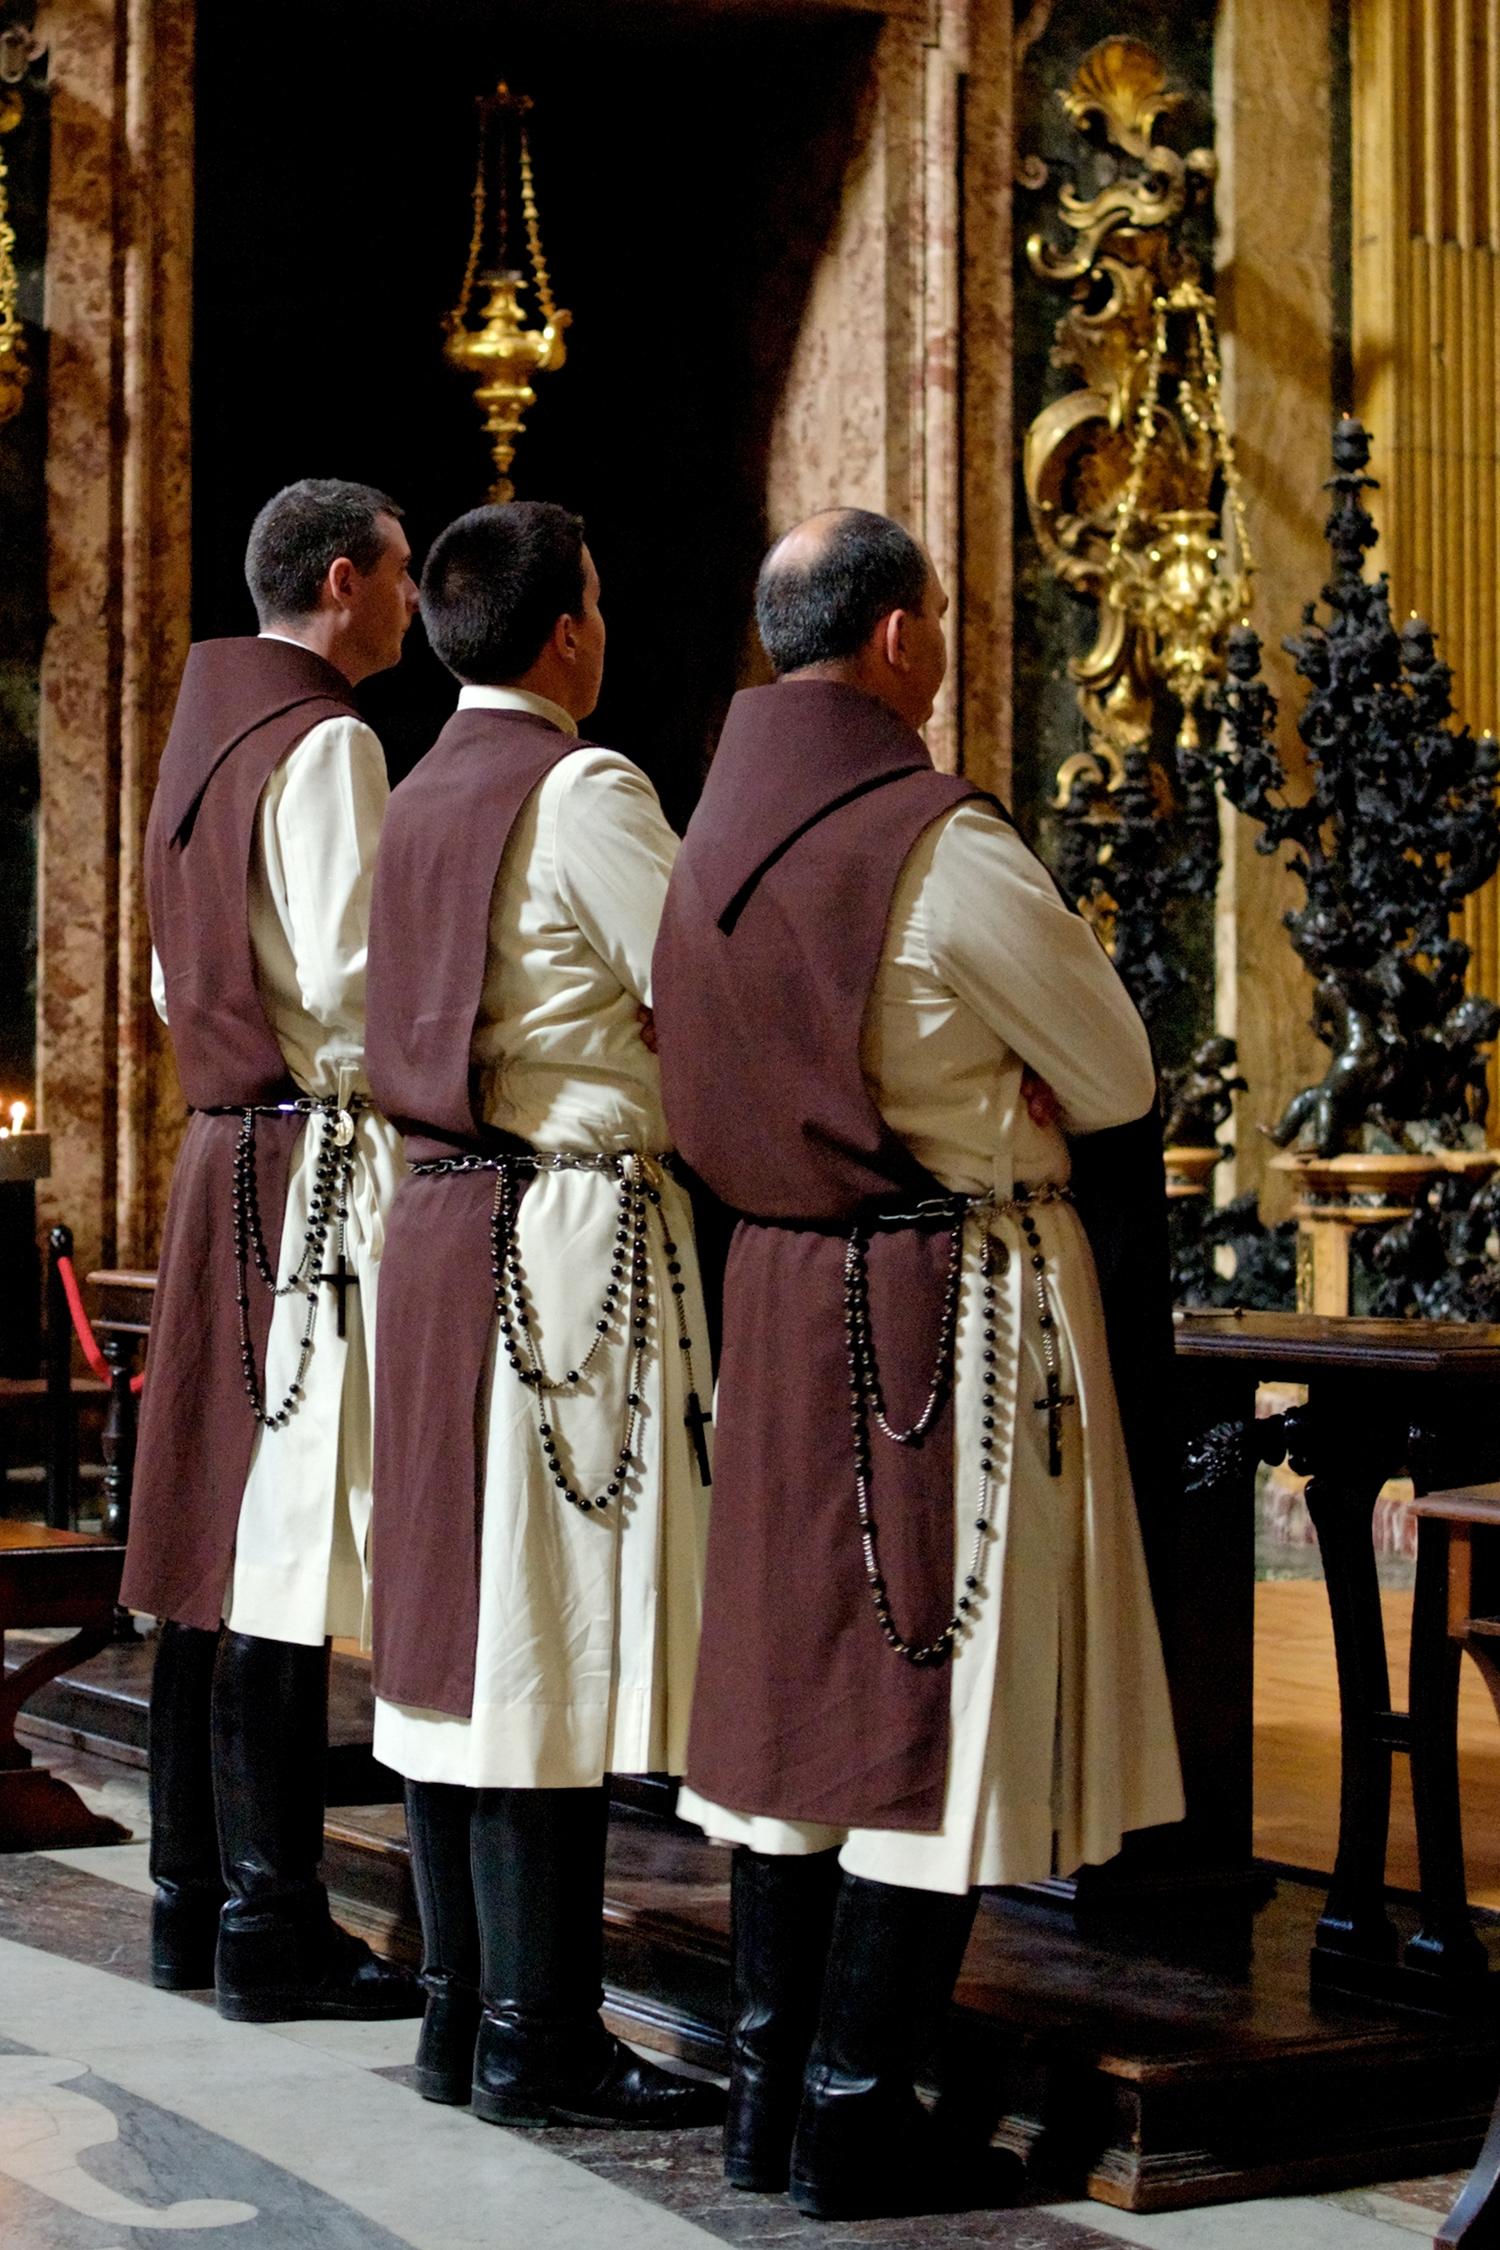 Pius xii encyclical virginity already